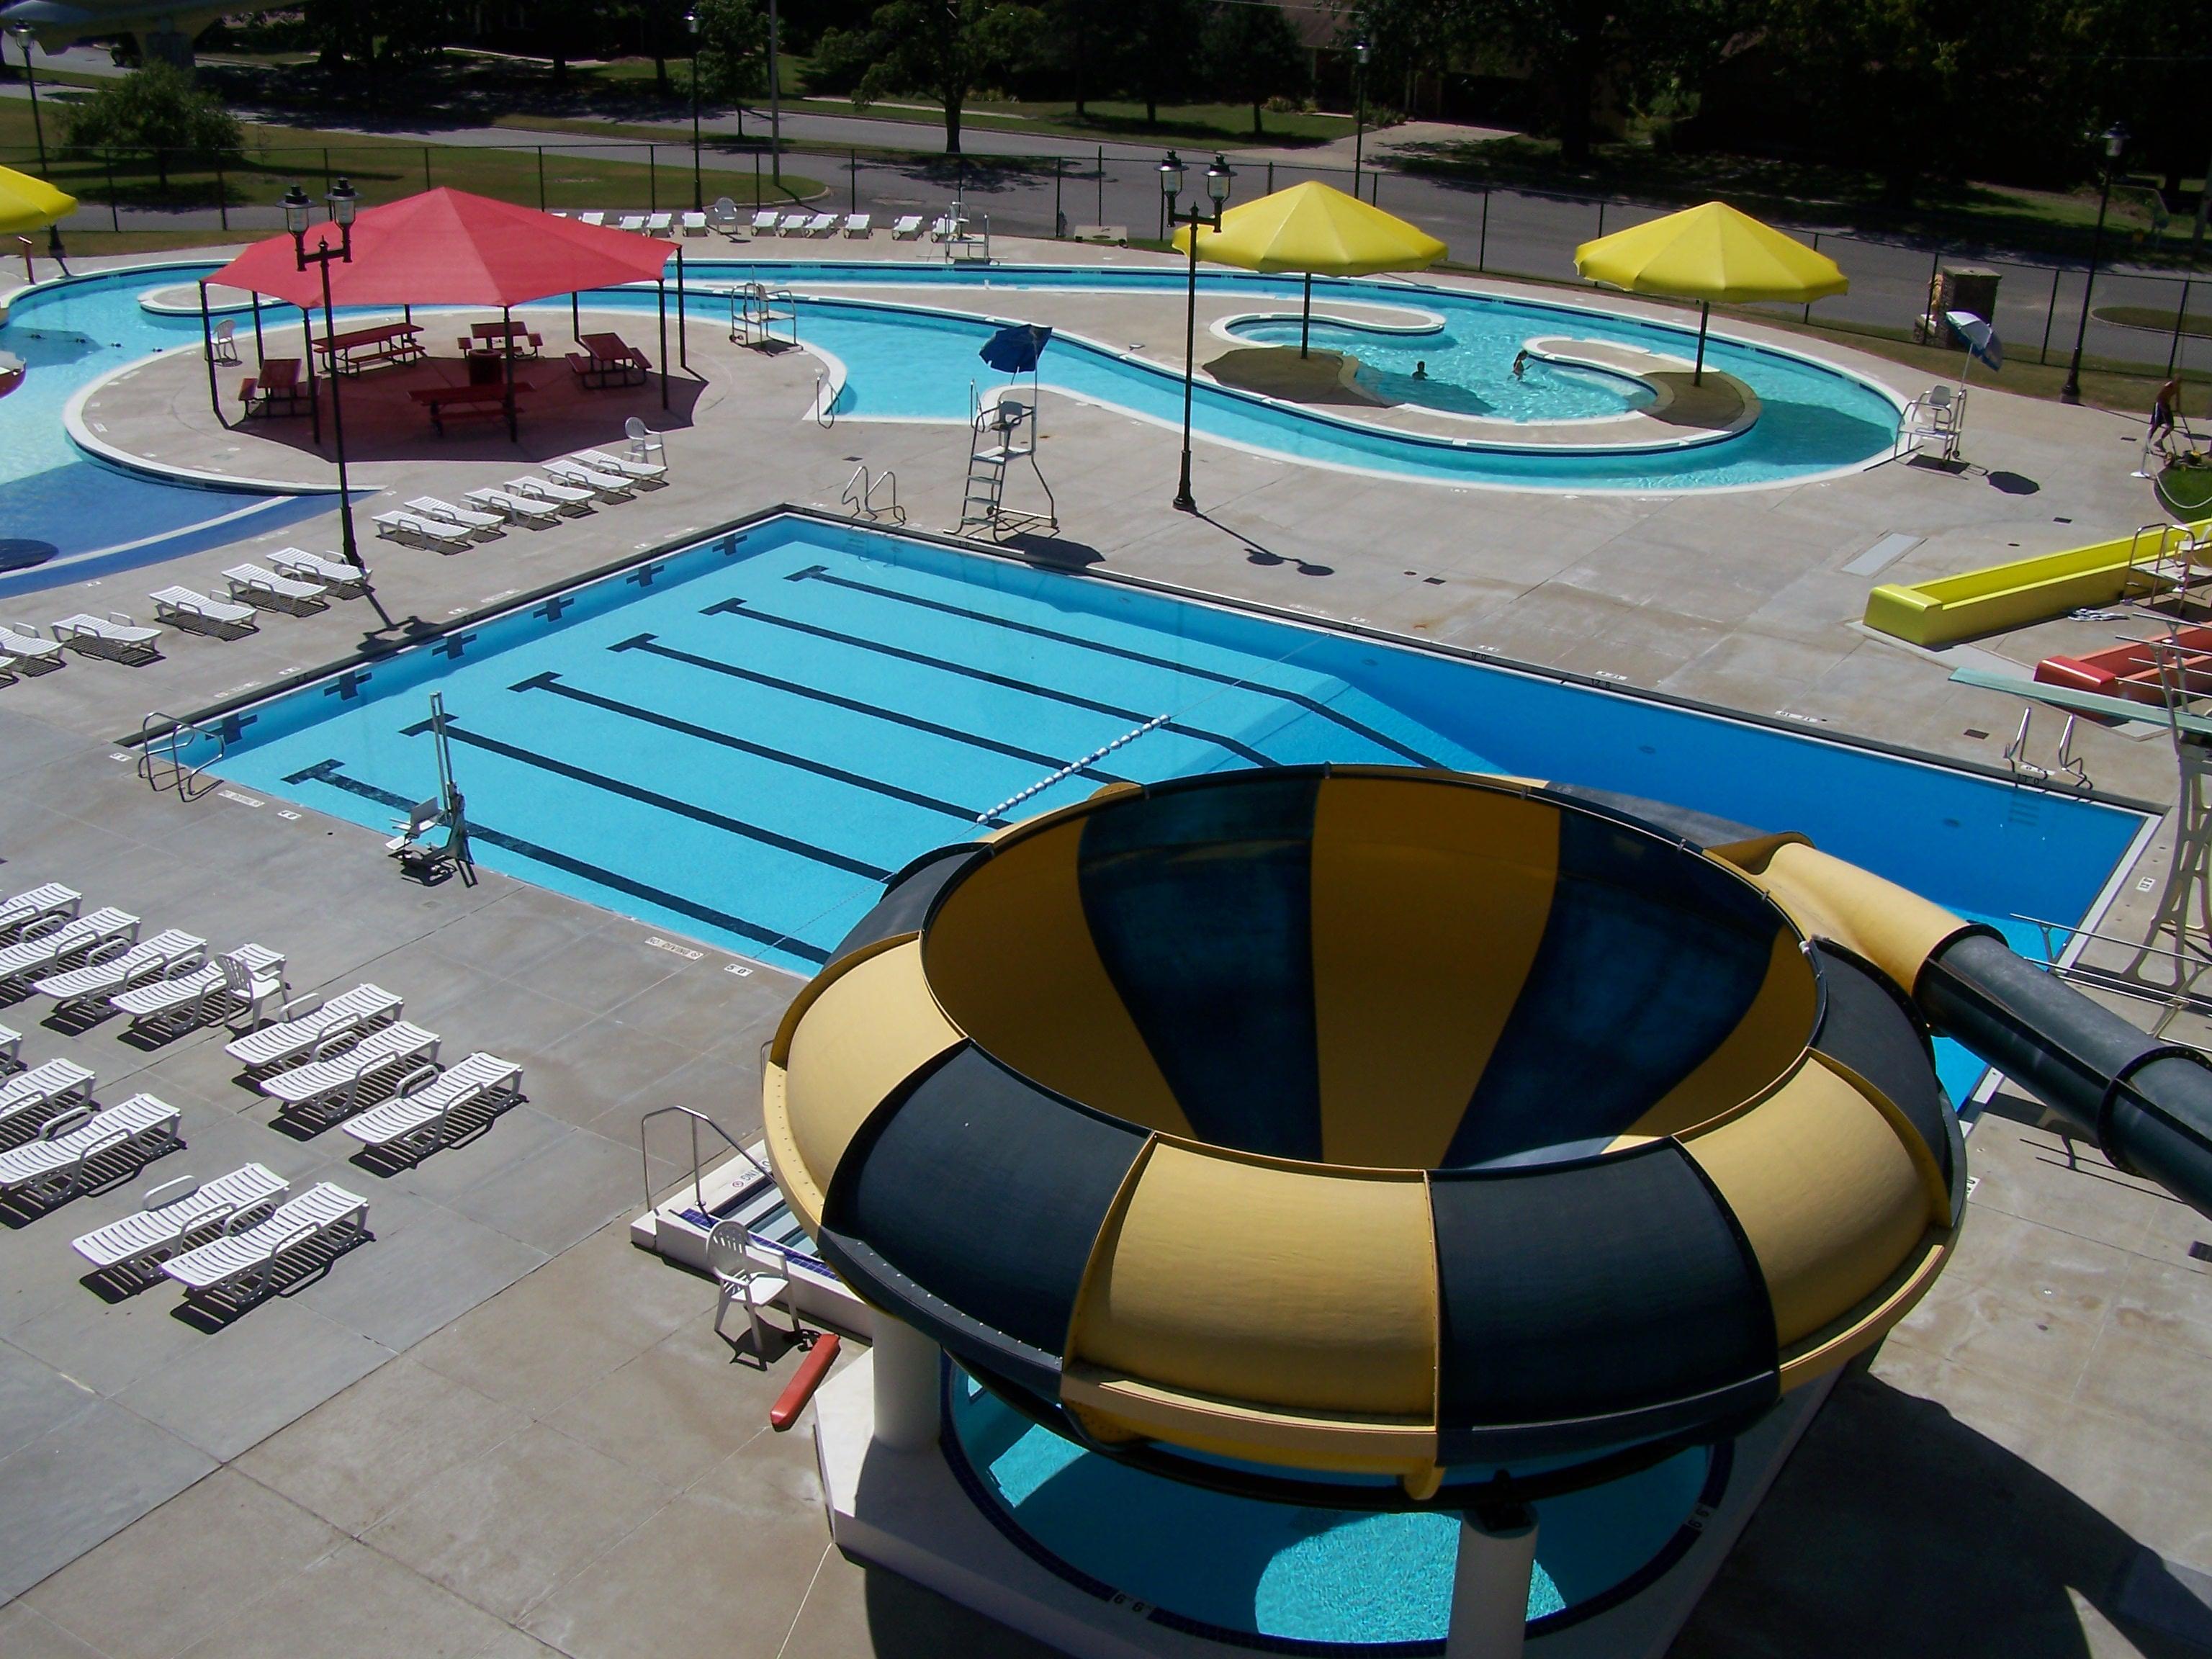 Aquatic center olds aquatic center for Garden city ks swimming pool